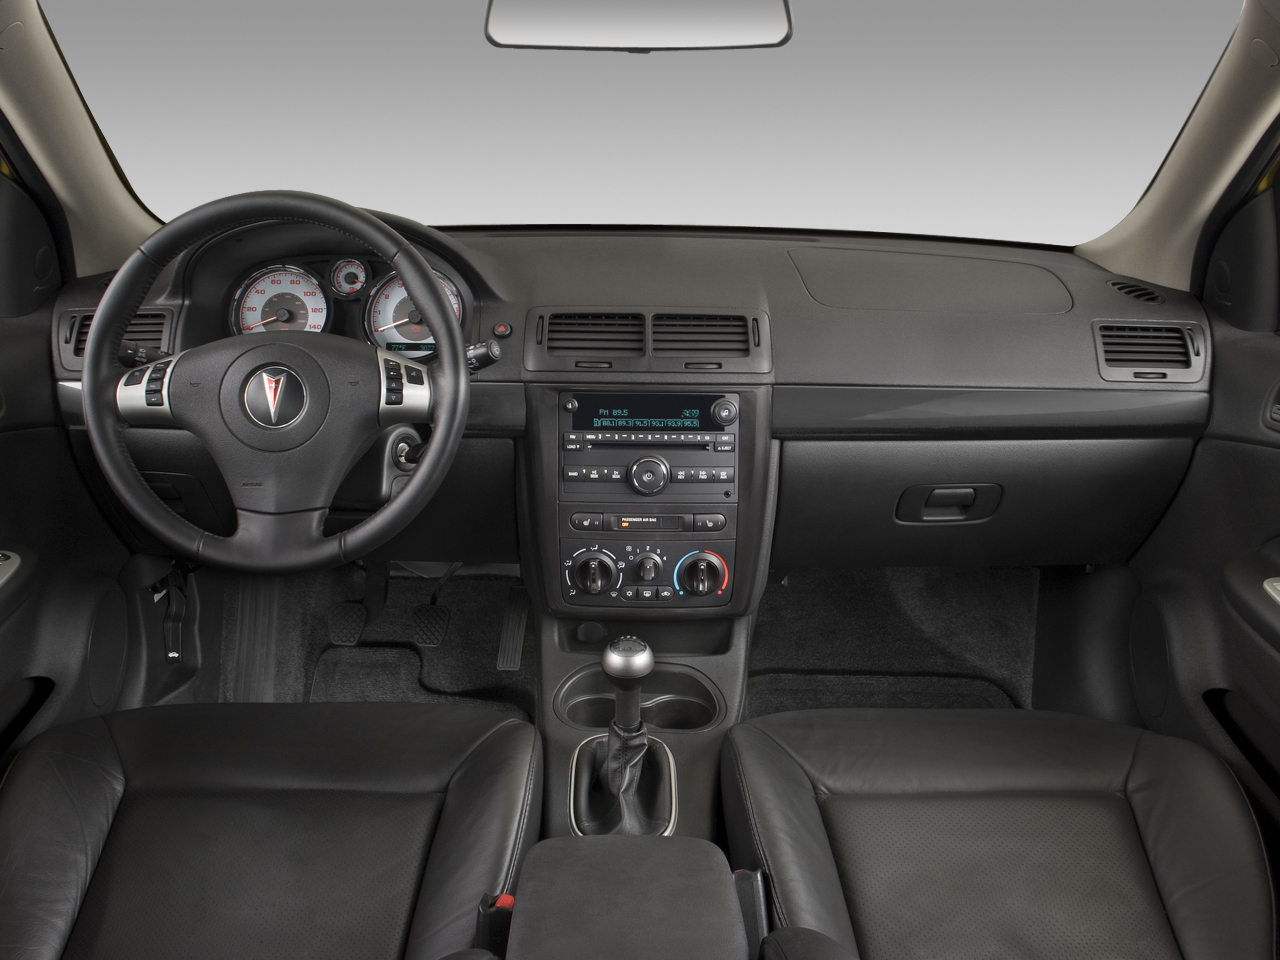 Pontiac G5 Gt Picture 7 Reviews News Specs Buy Car